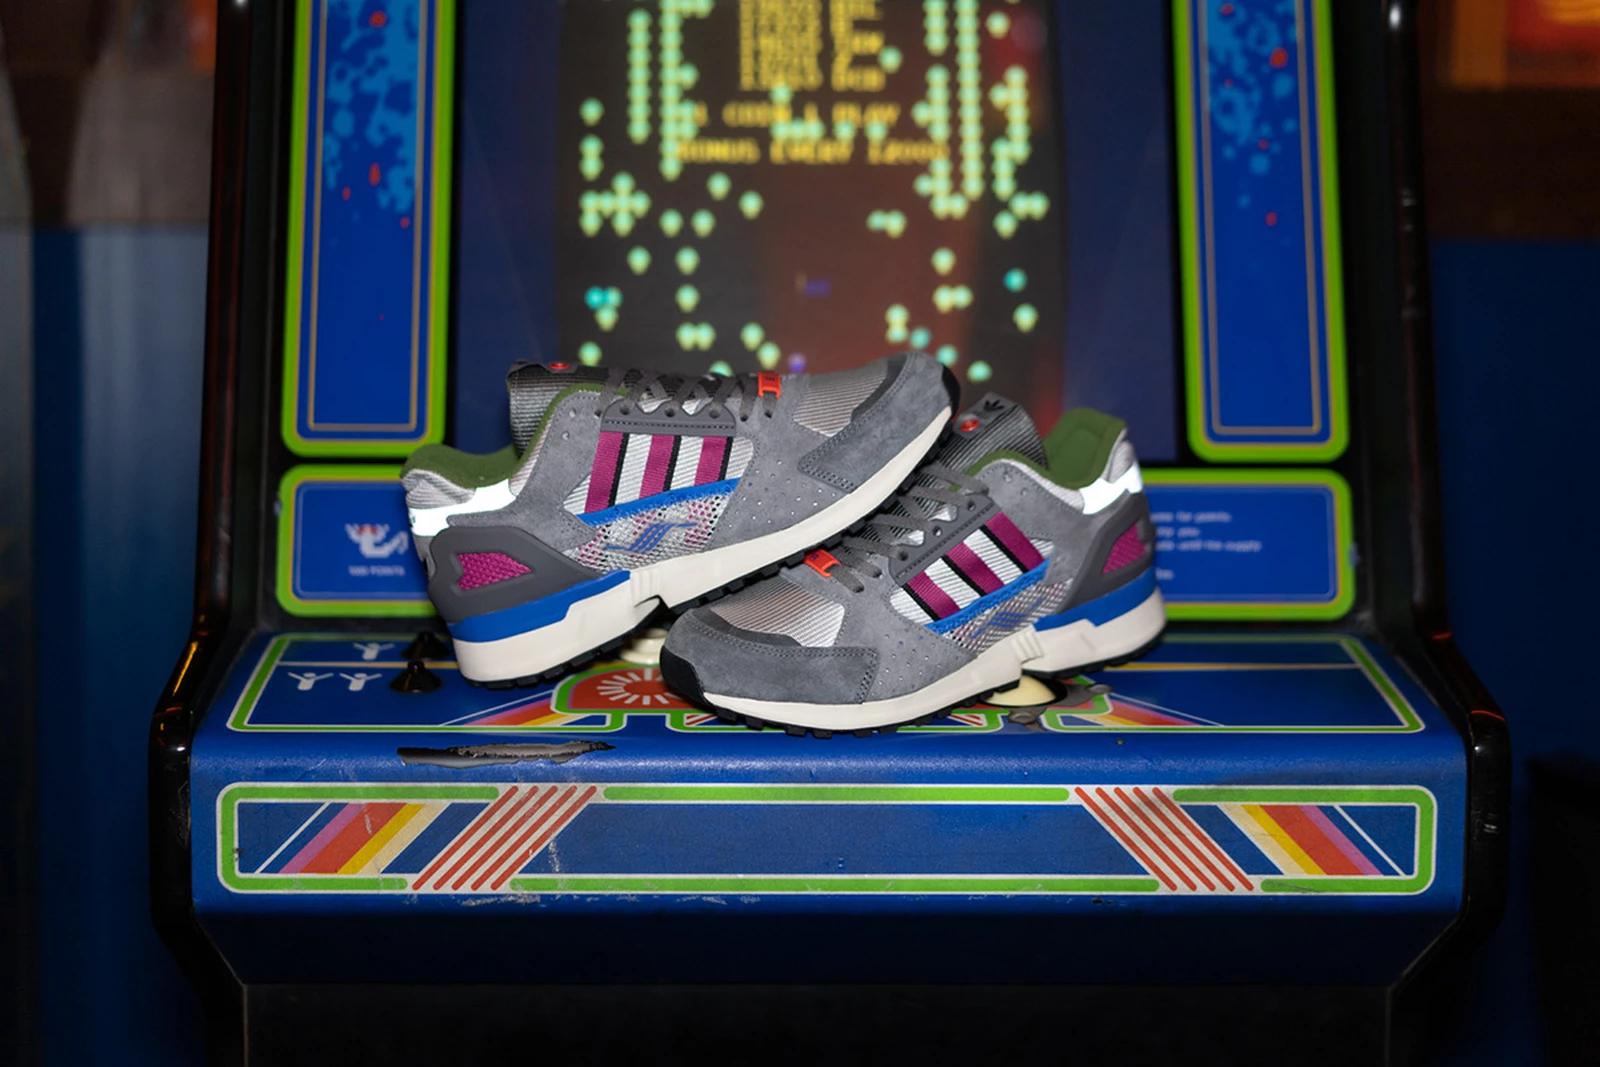 overkill adidas zx1000c